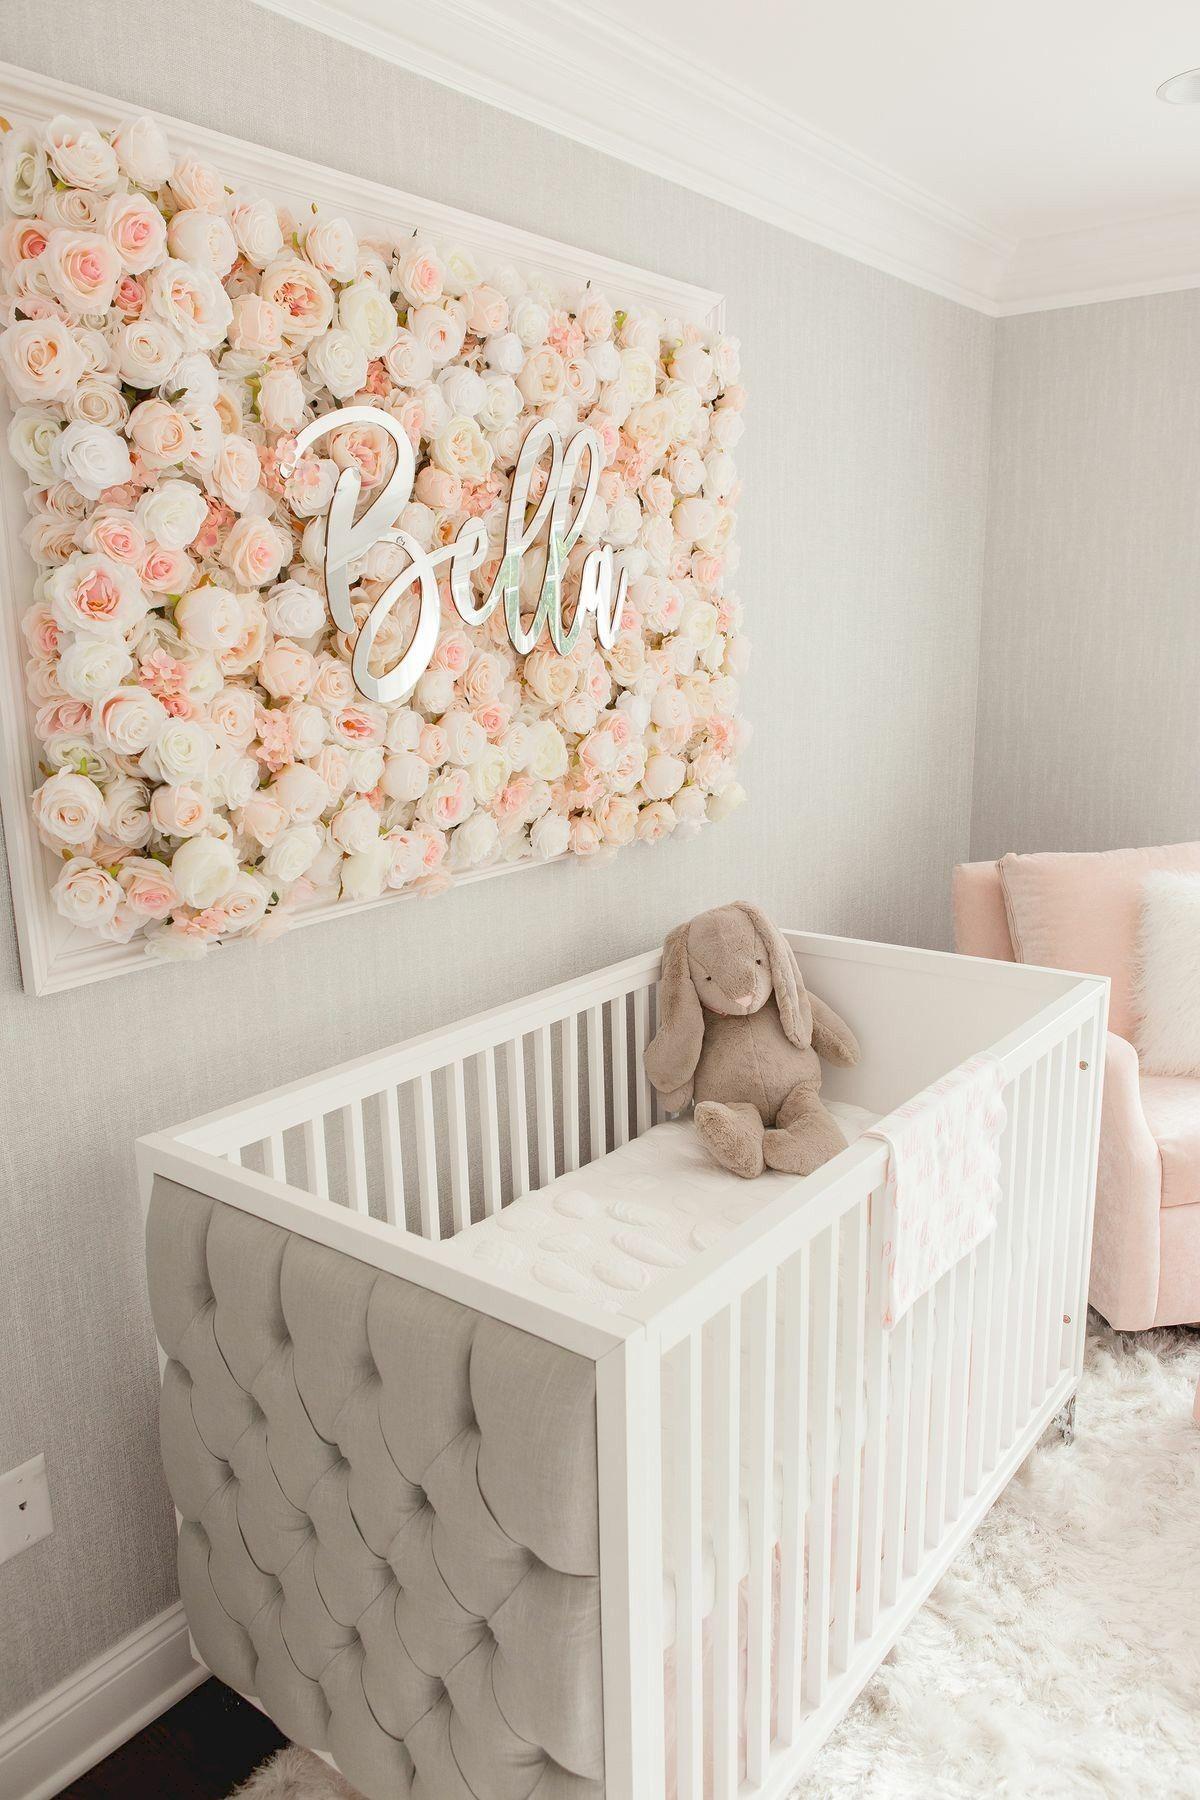 50 Beautiful Baby Nursery Ideas For